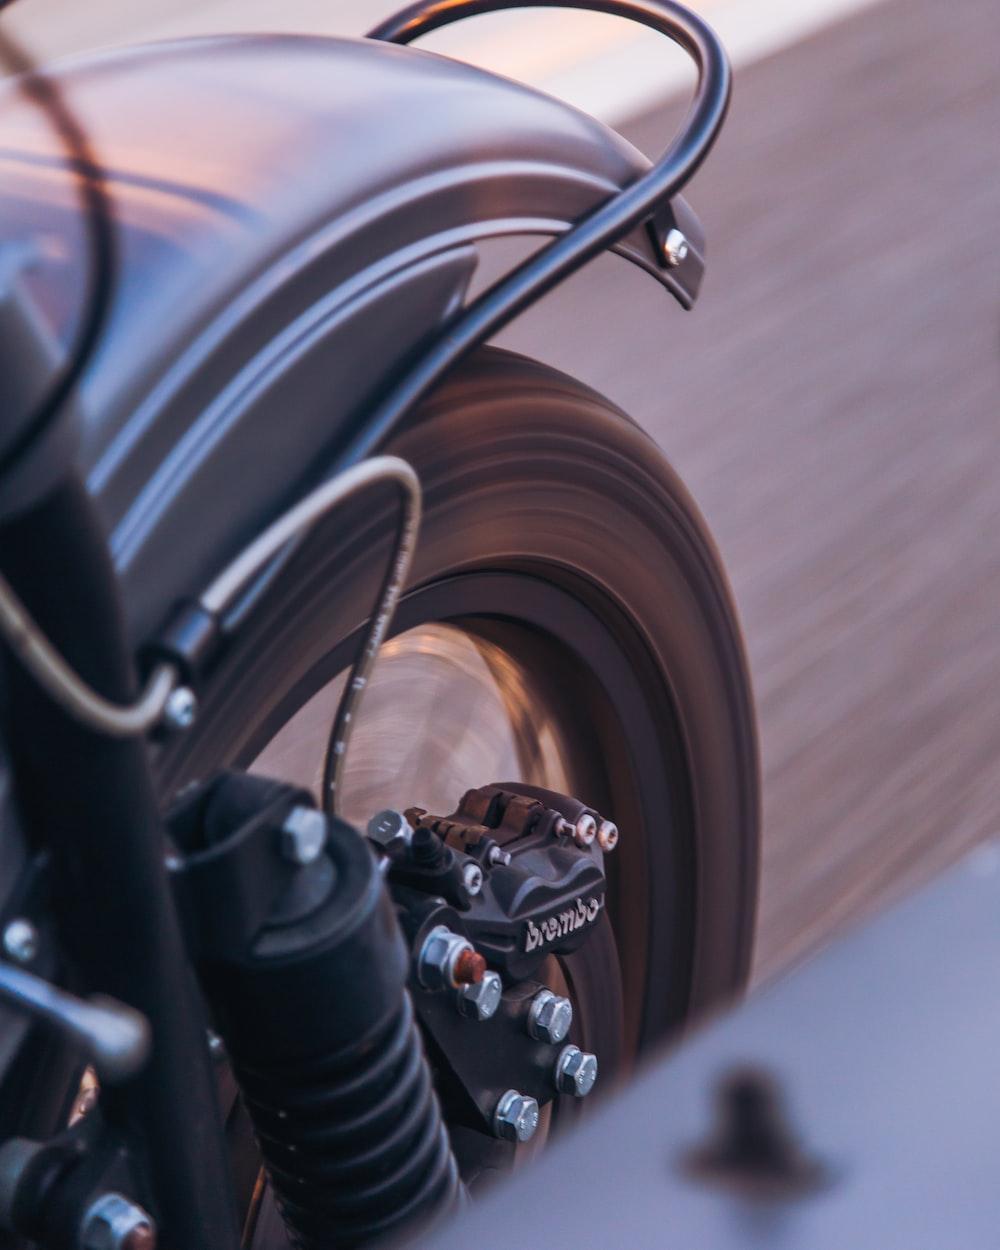 running black motorcycle TWO WHEELER SAFETY